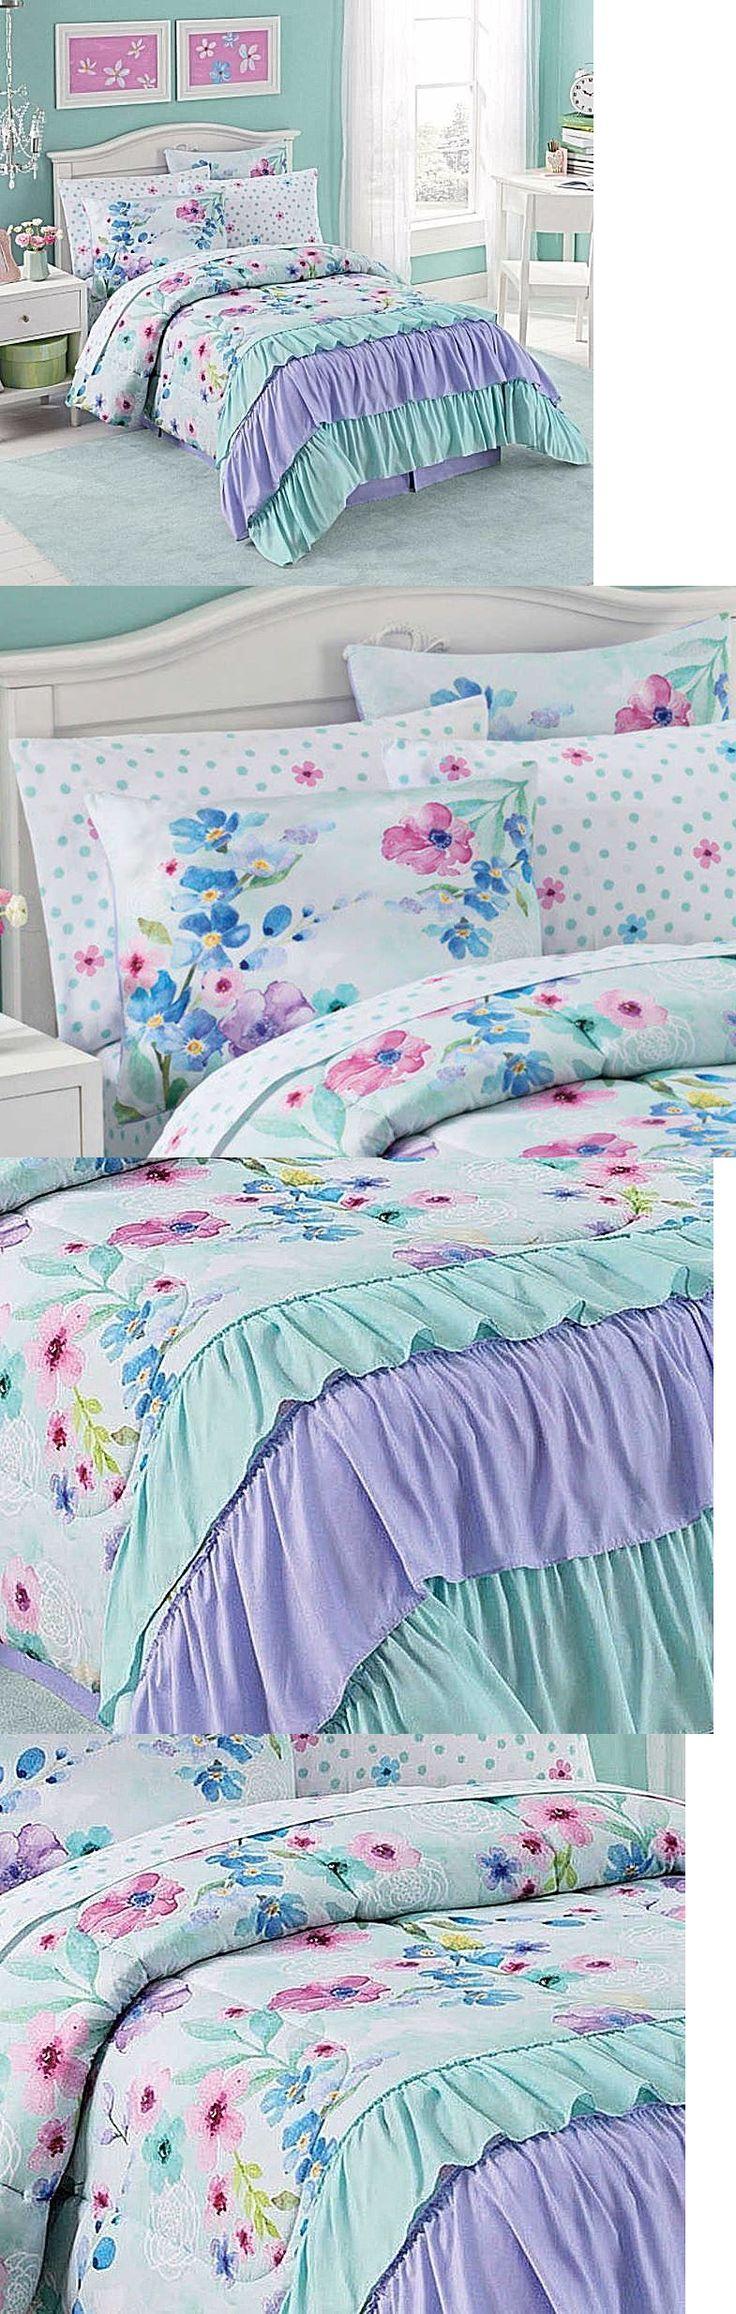 hip bedding - the best ruffled comforter ideas on pinterest ruffle bedding